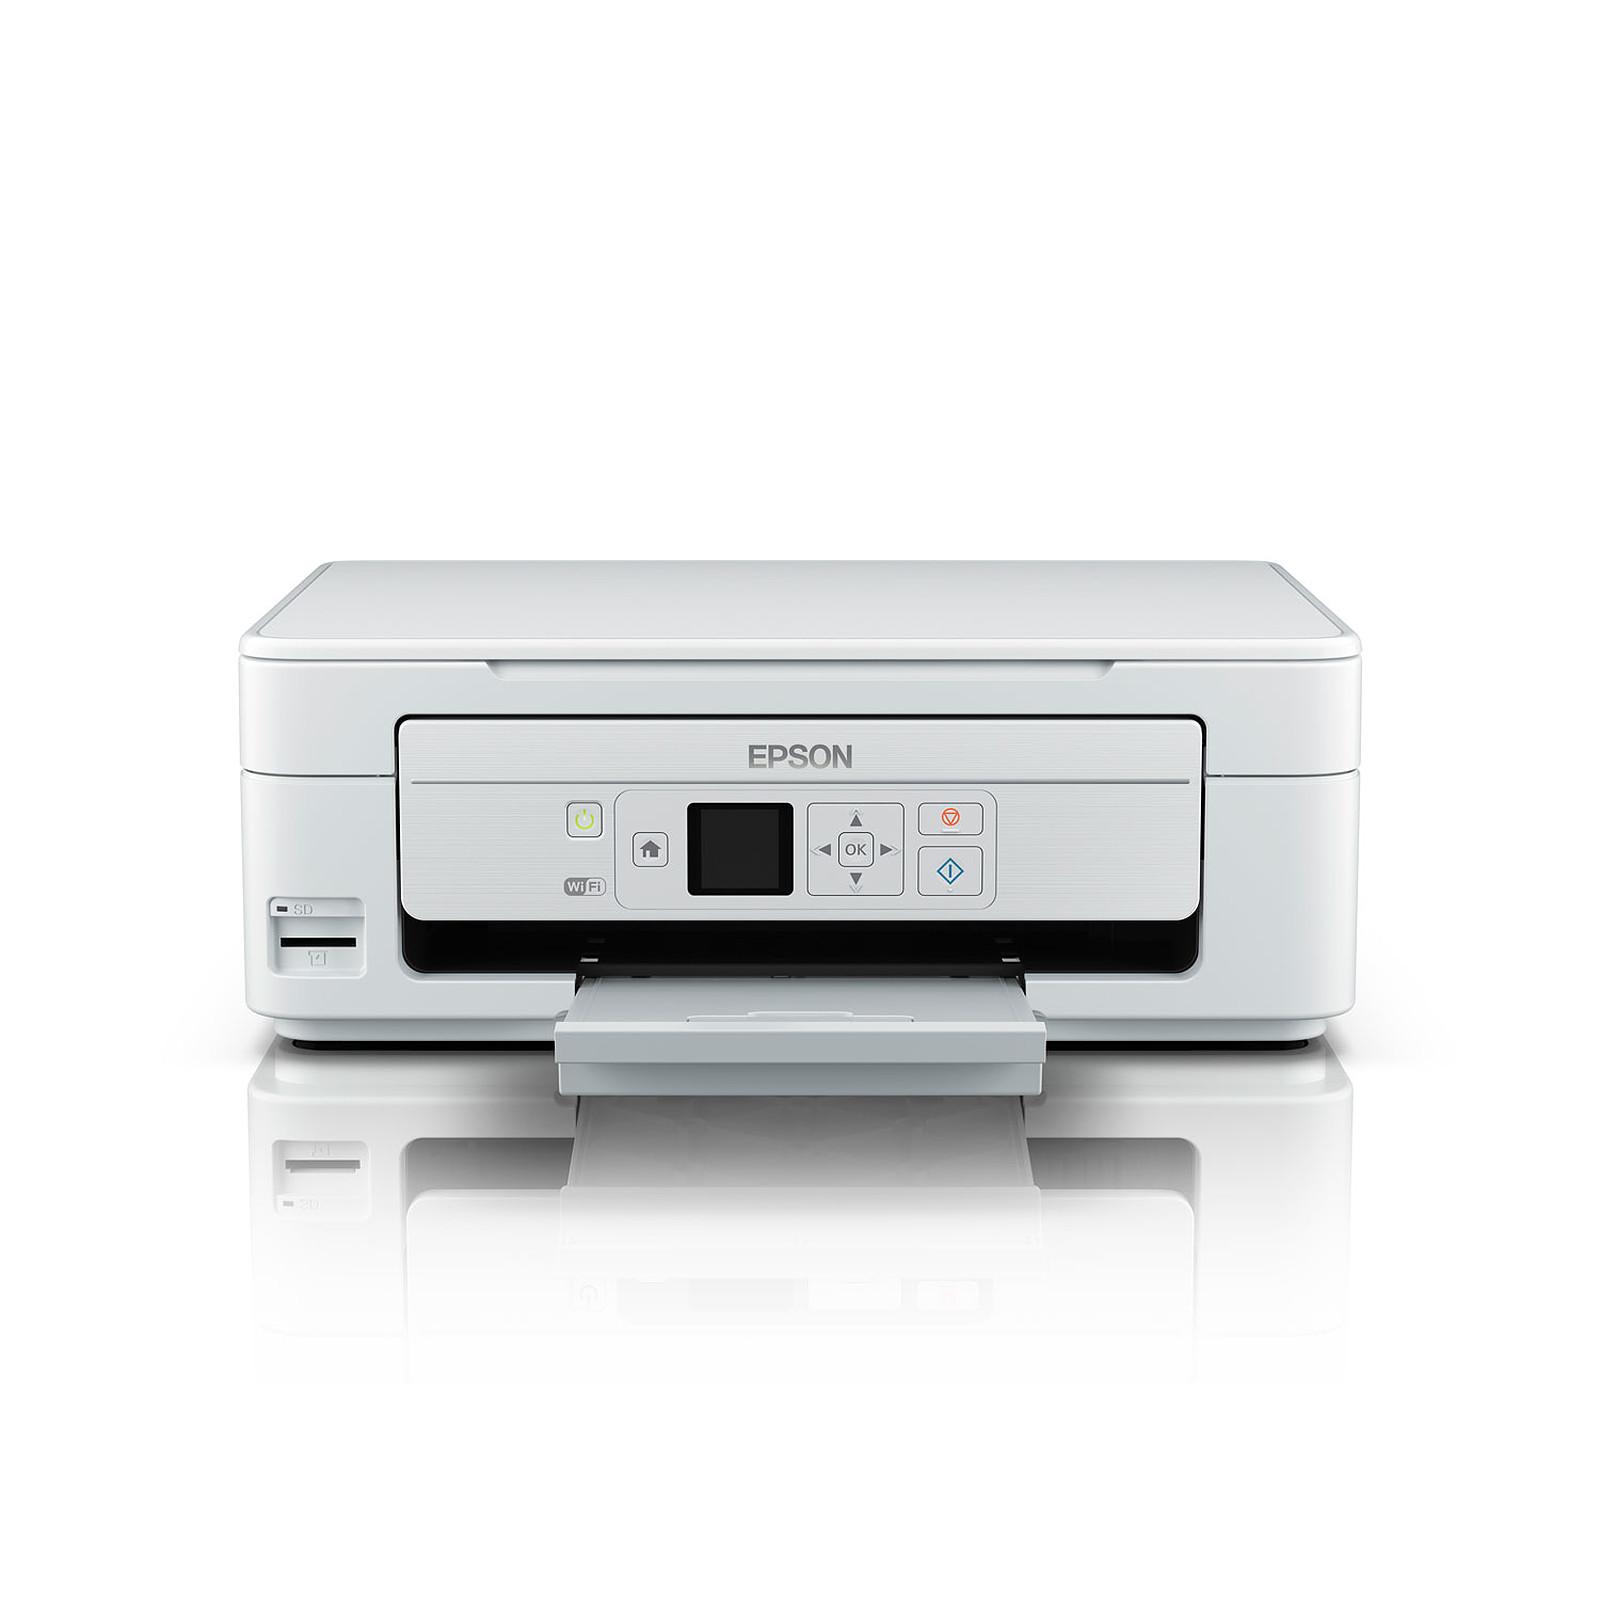 epson expression home xp 345 blanc imprimante multifonction epson sur. Black Bedroom Furniture Sets. Home Design Ideas